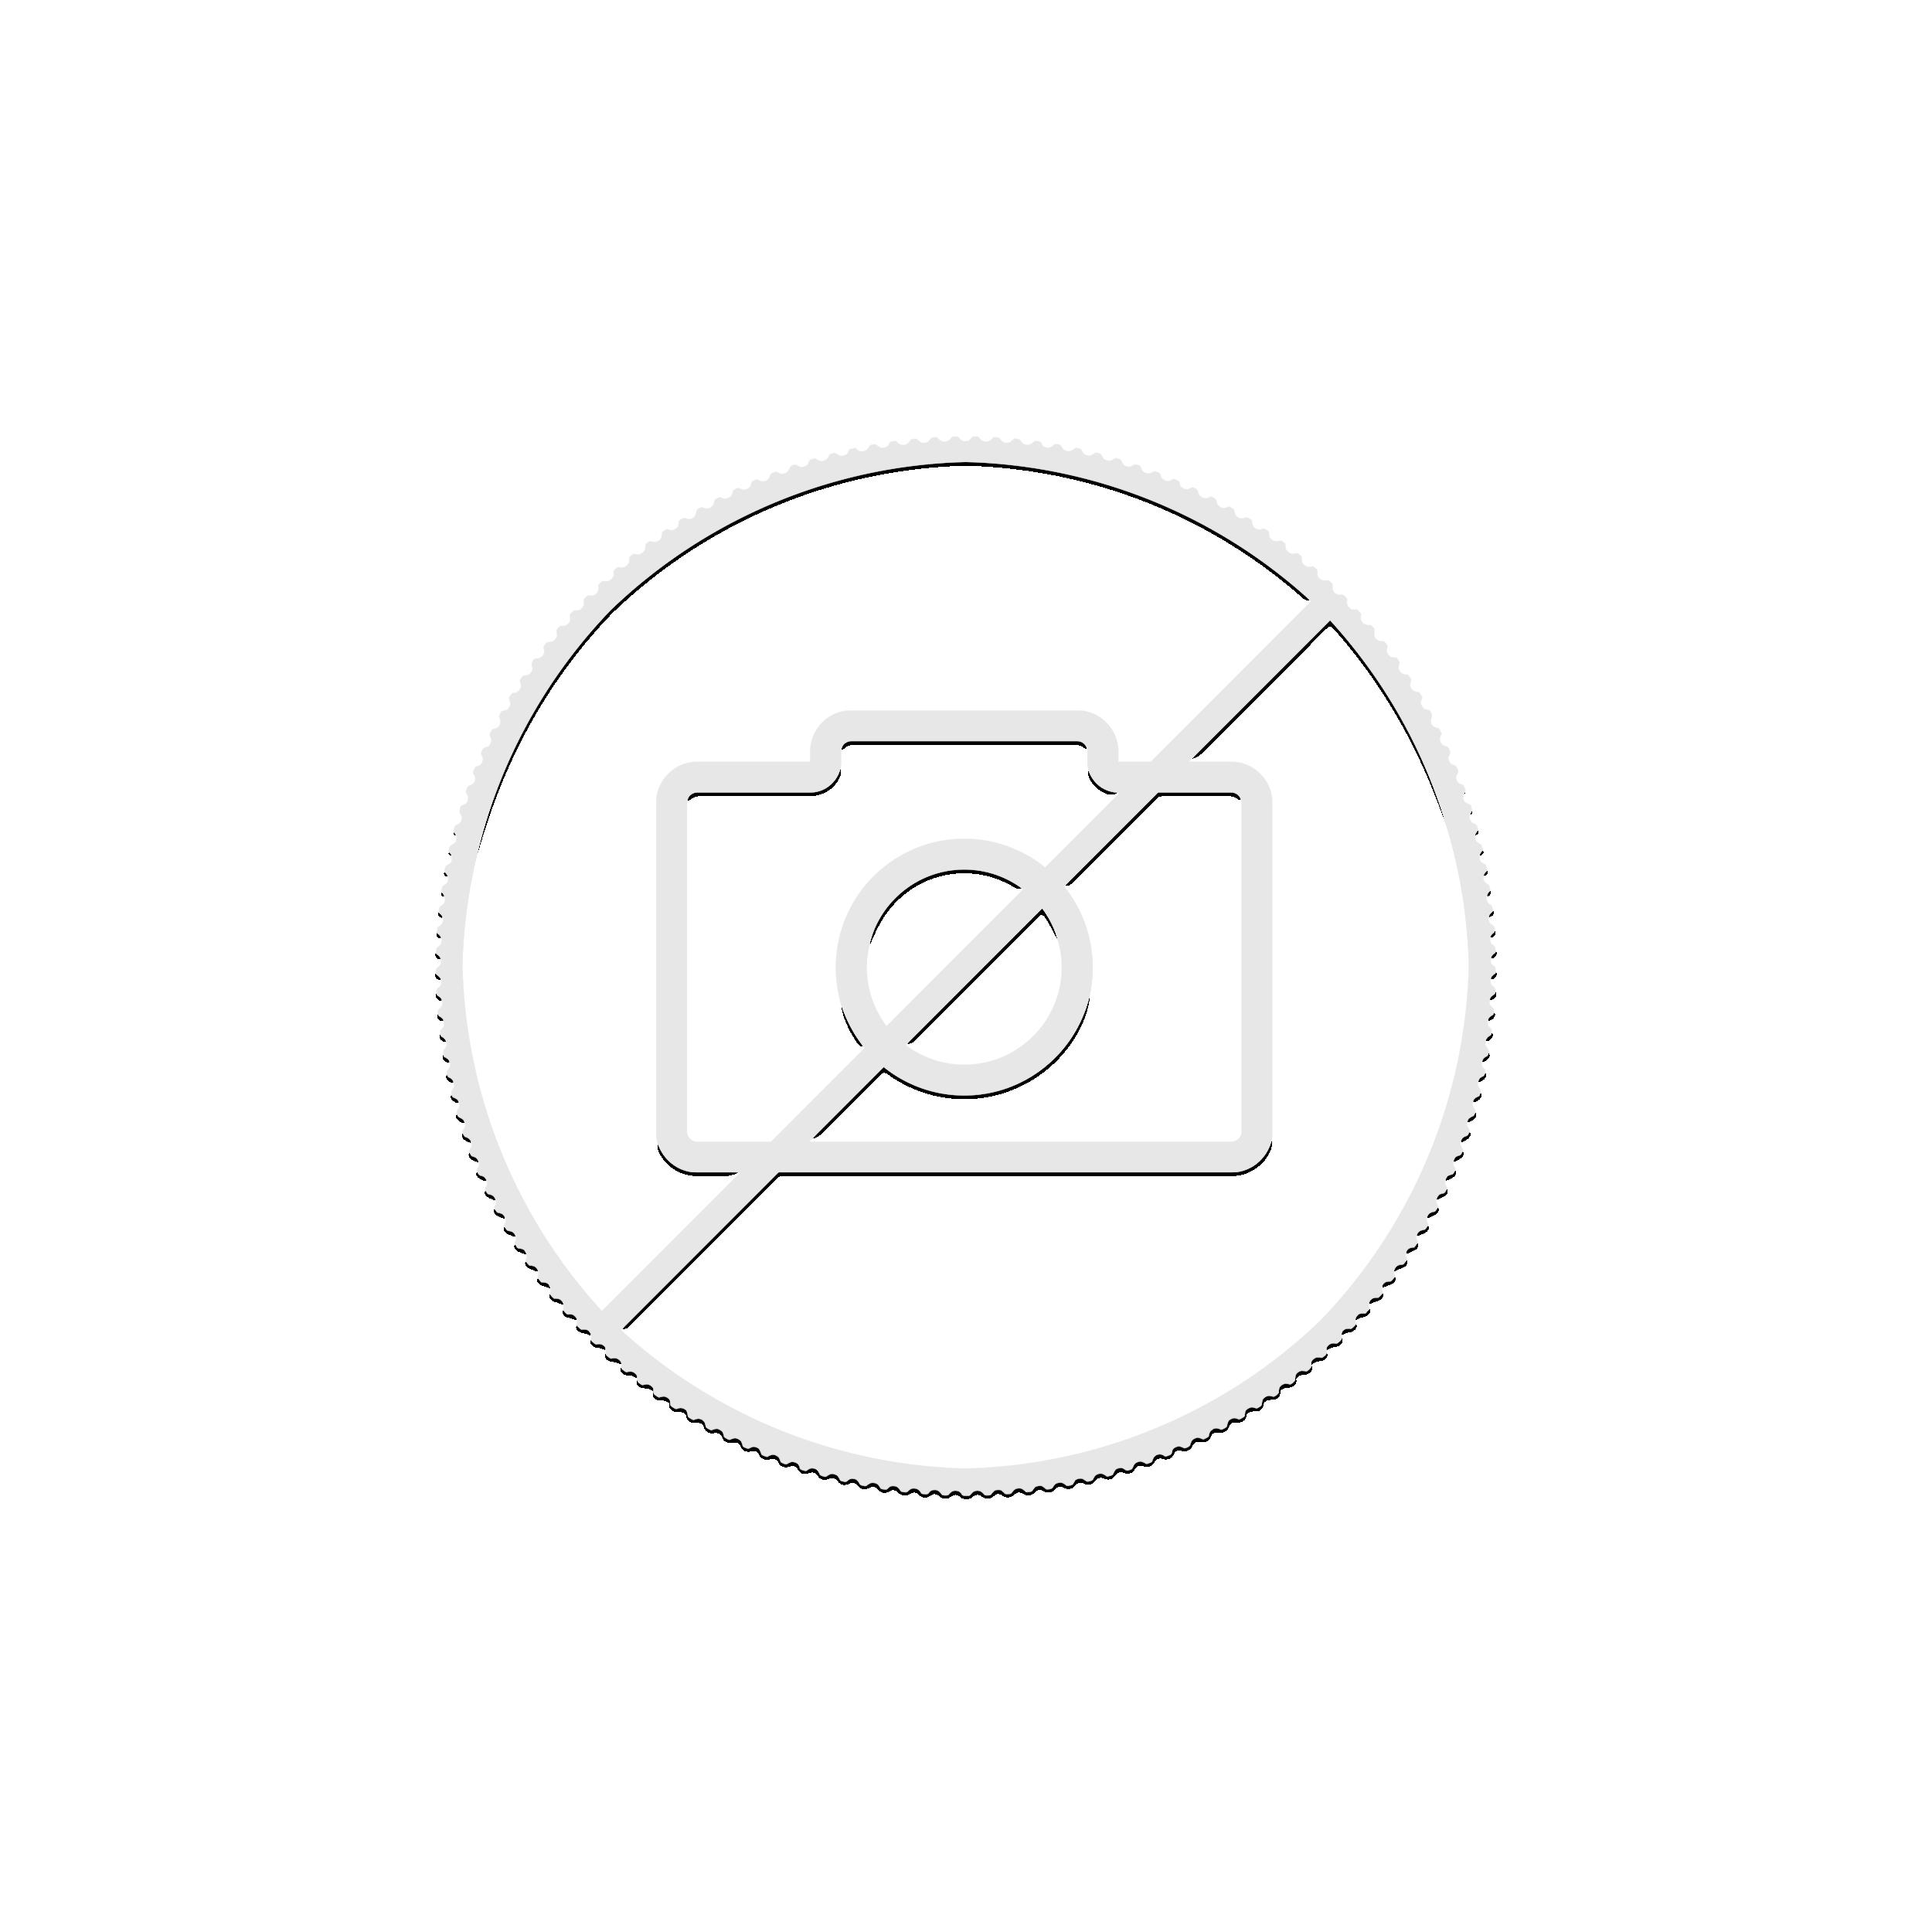 1 Troy ounce gold coin Royal Arms 2021